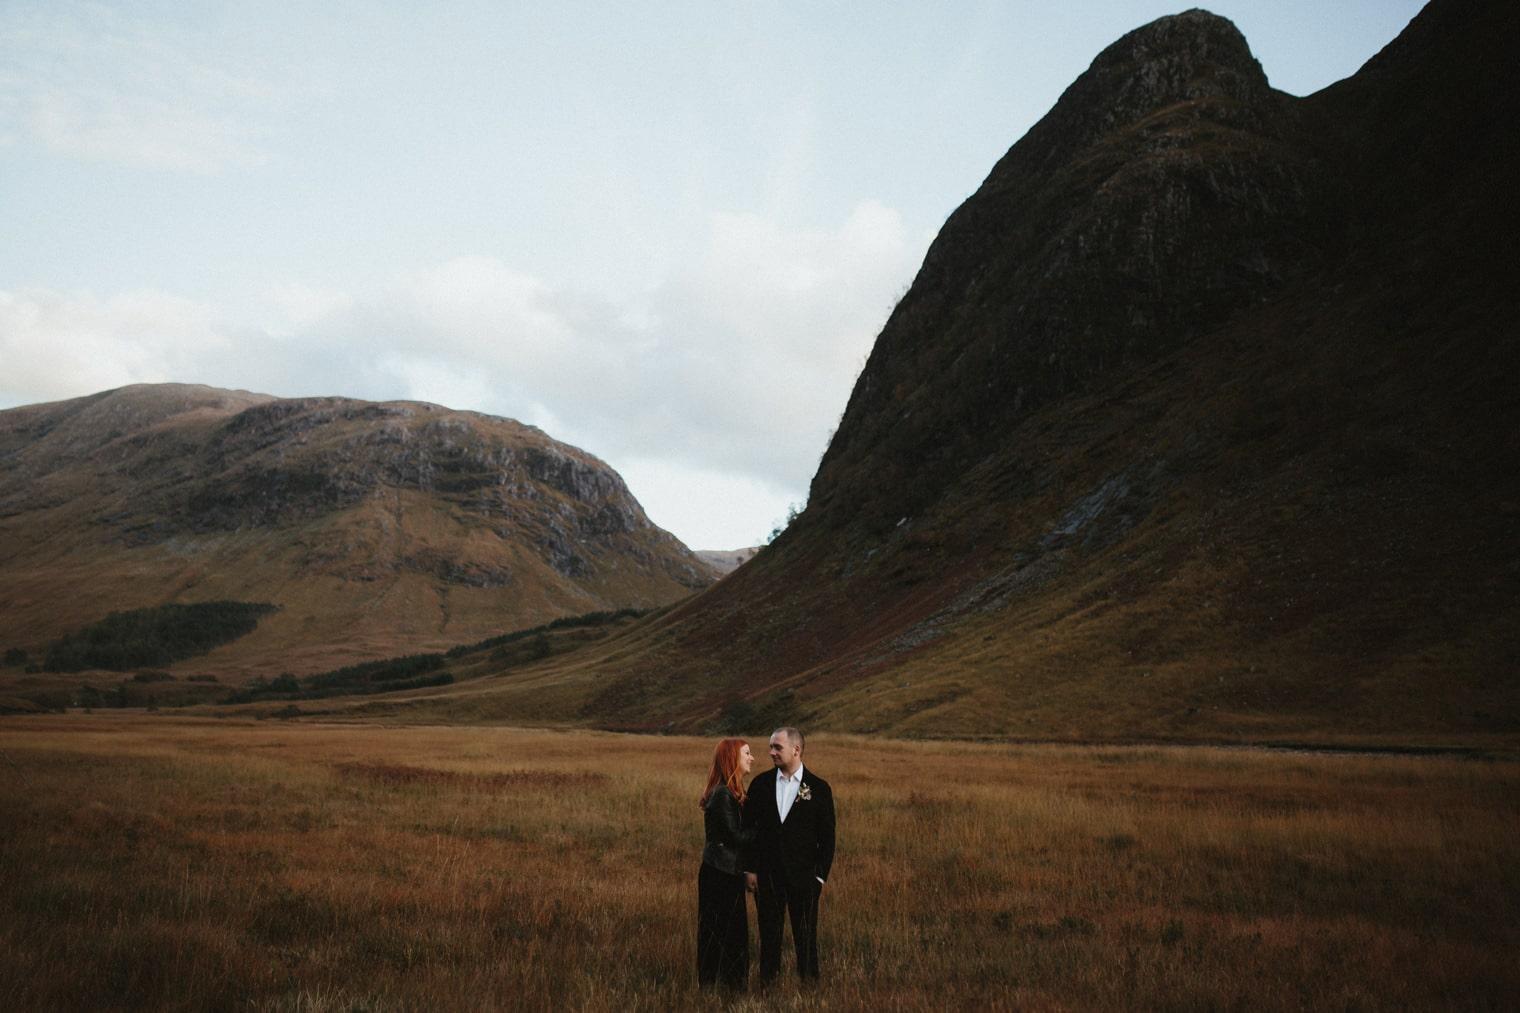 scottish highlands elopement with bride in black jumpsuit